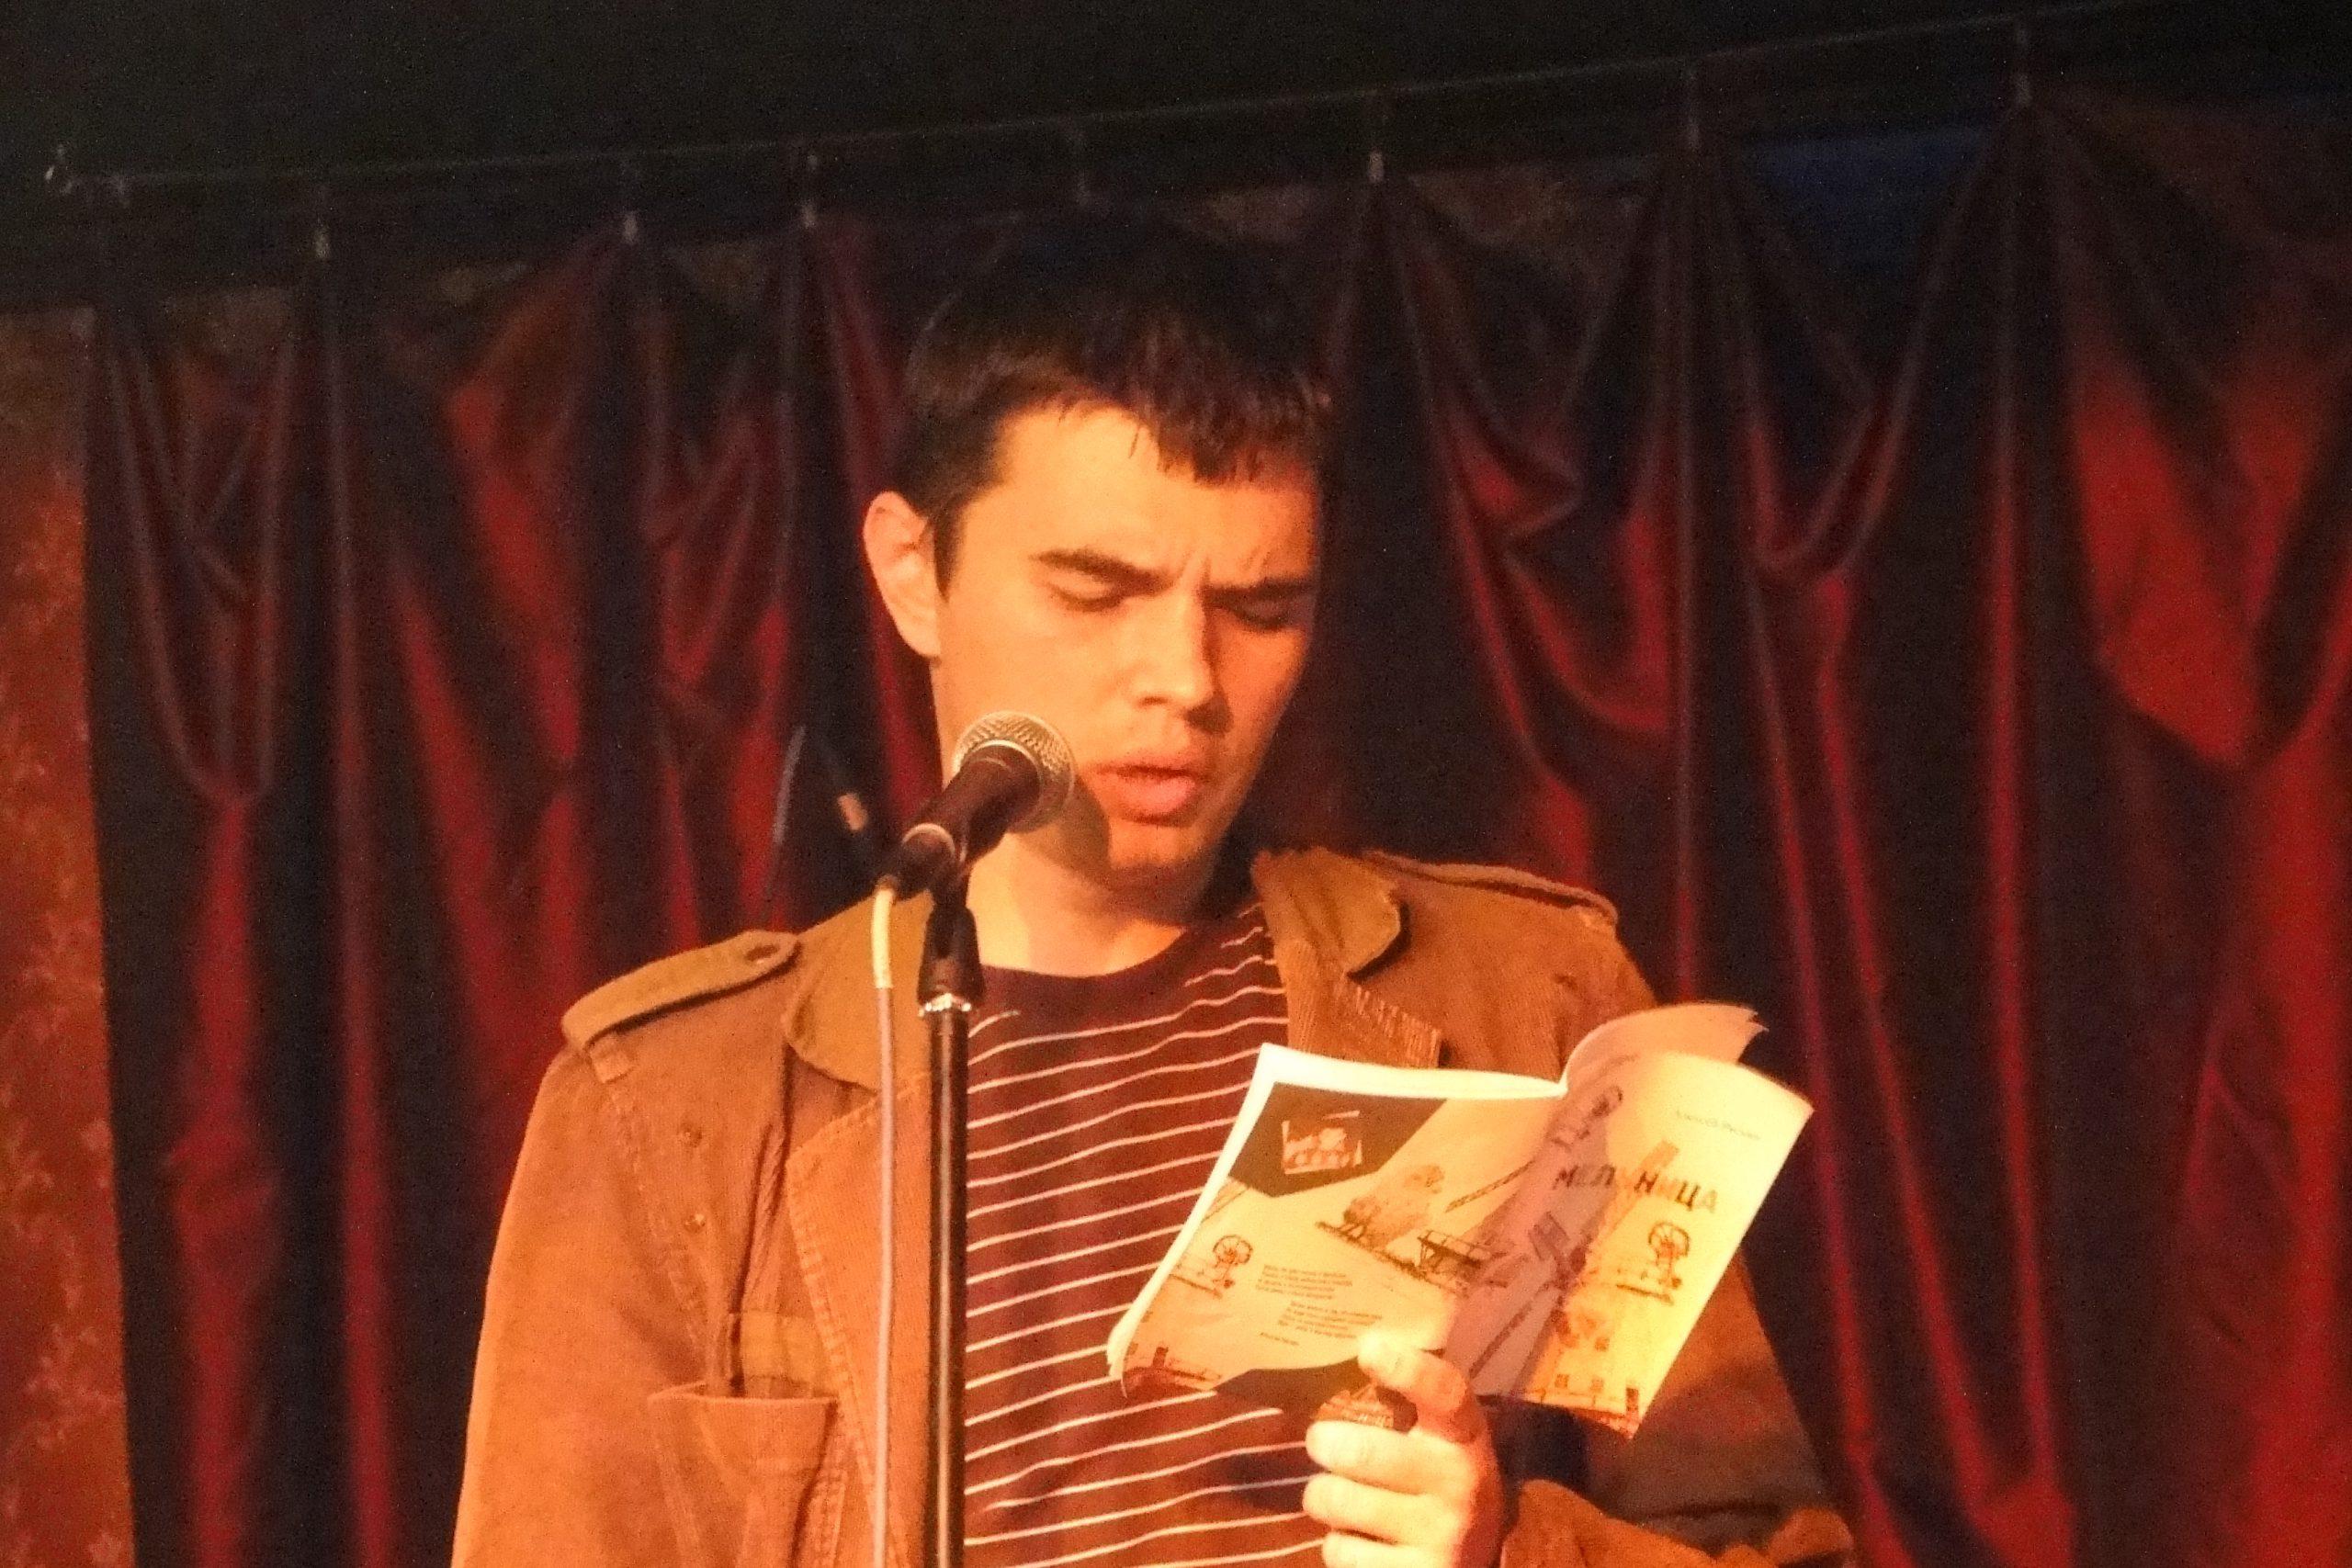 Lesung mit Aleksej Rjaskin am 28.09.2011